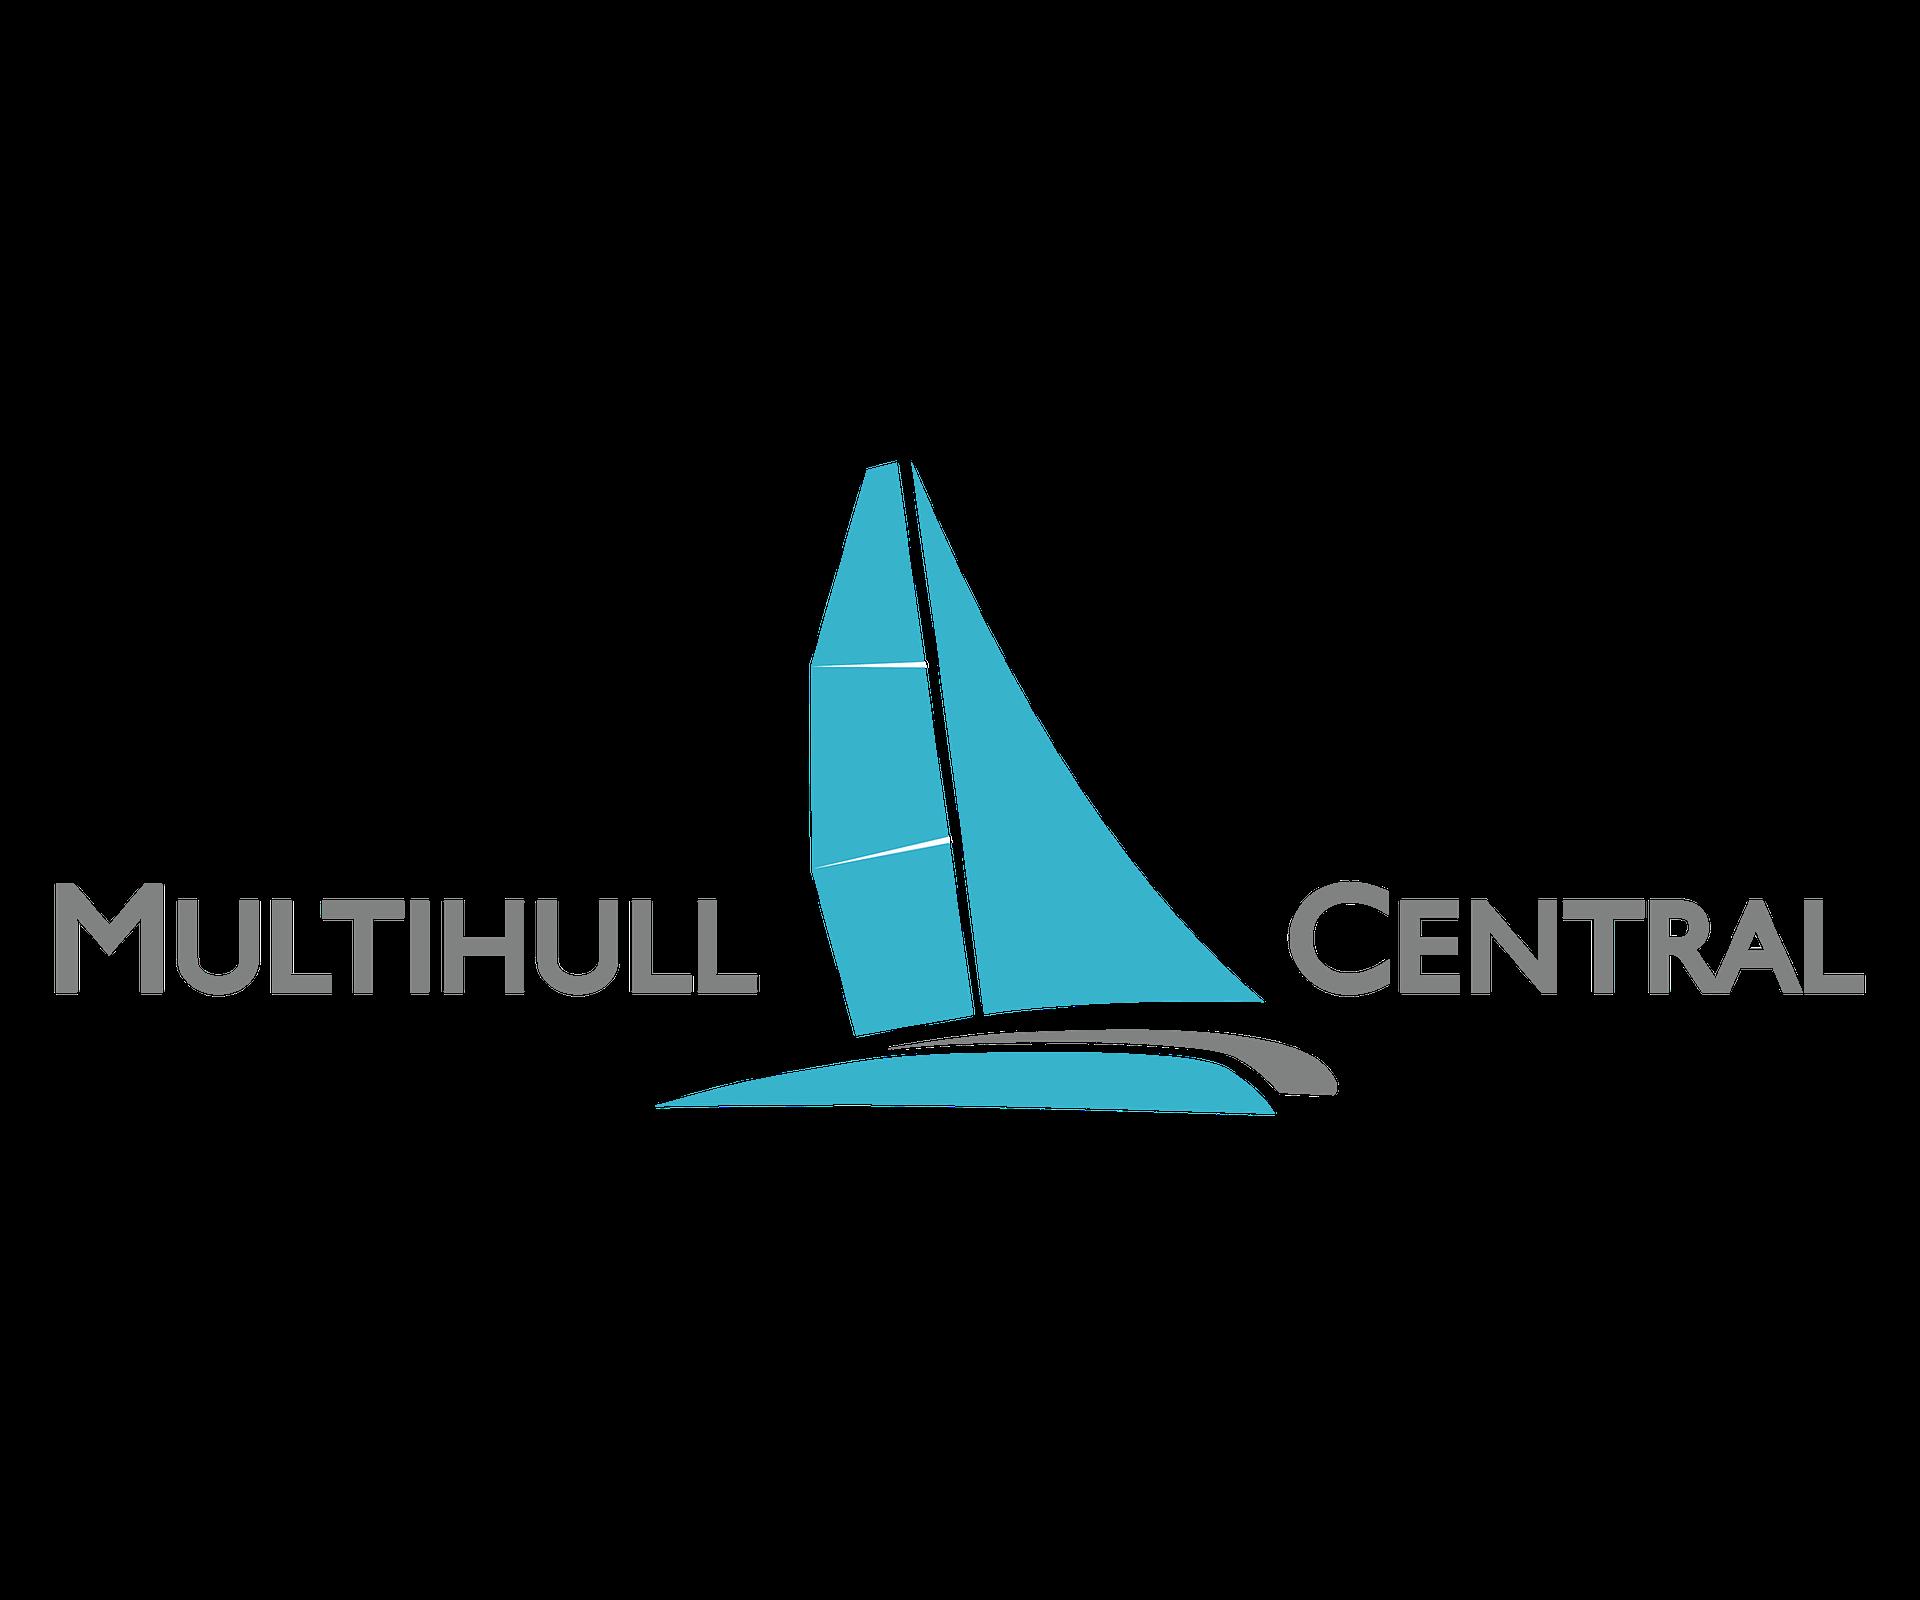 MultihullCentral